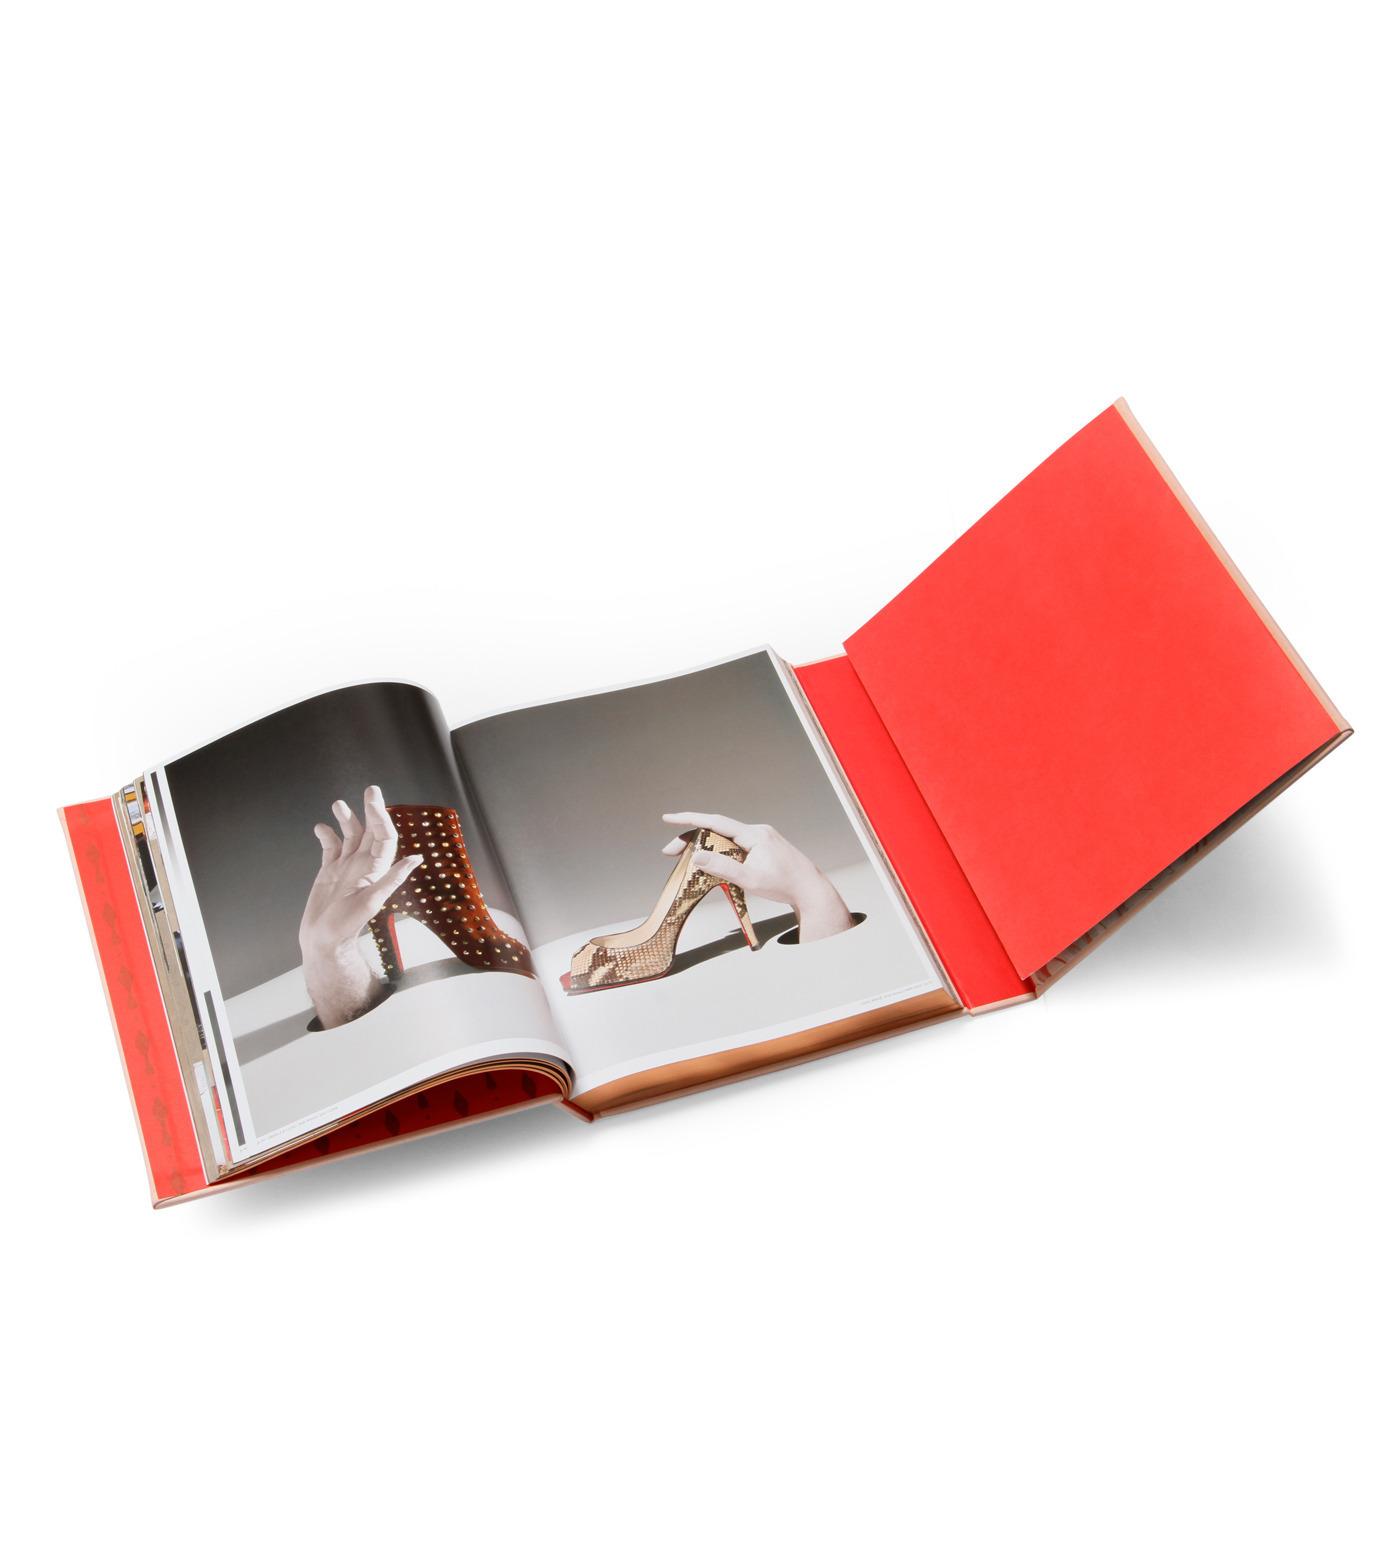 ArtBook(アートブック)のChristian Louboutin-SALMON PINK(インテリア/OTHER-GOODS/interior/OTHER-GOODS)-8478-3651-7-73 拡大詳細画像3